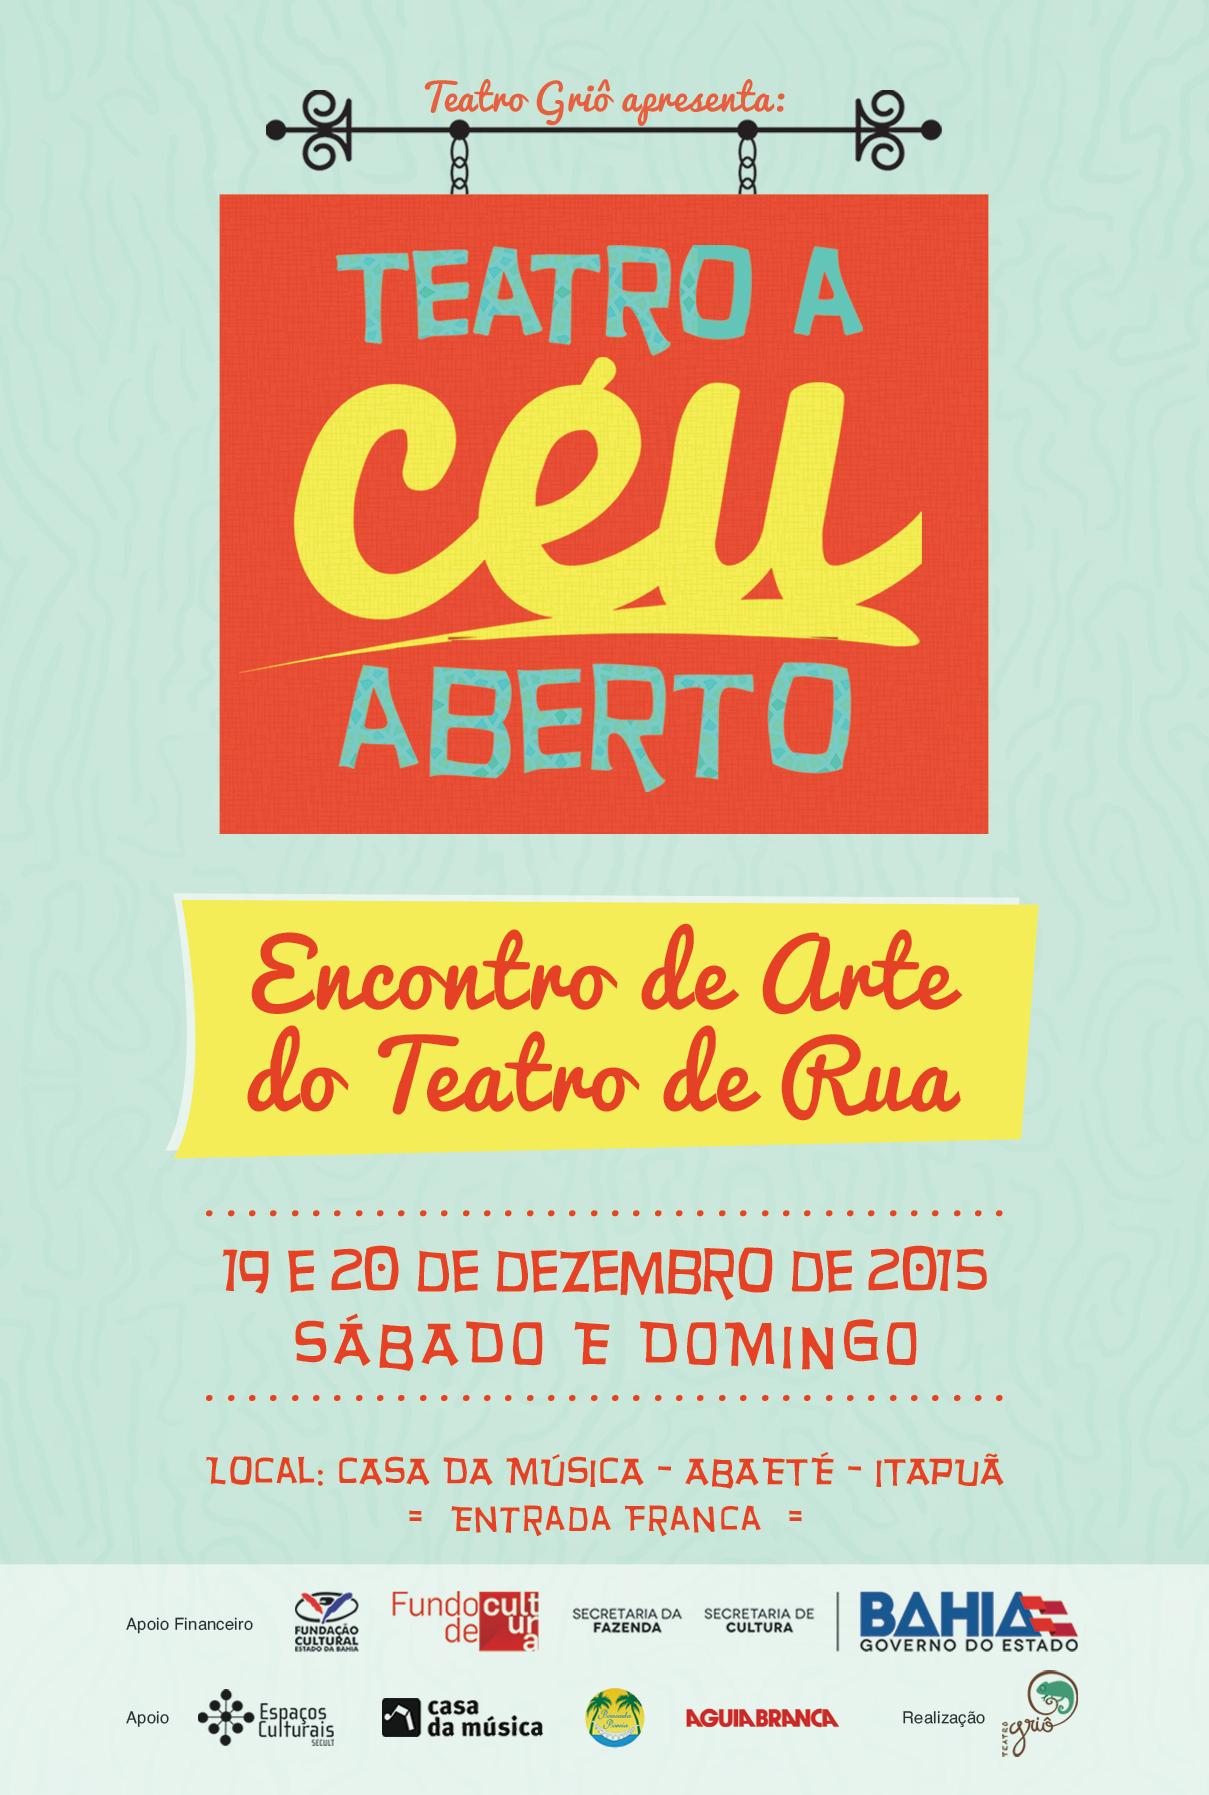 Teatro-A-Ceu-Aberto_Cartaz